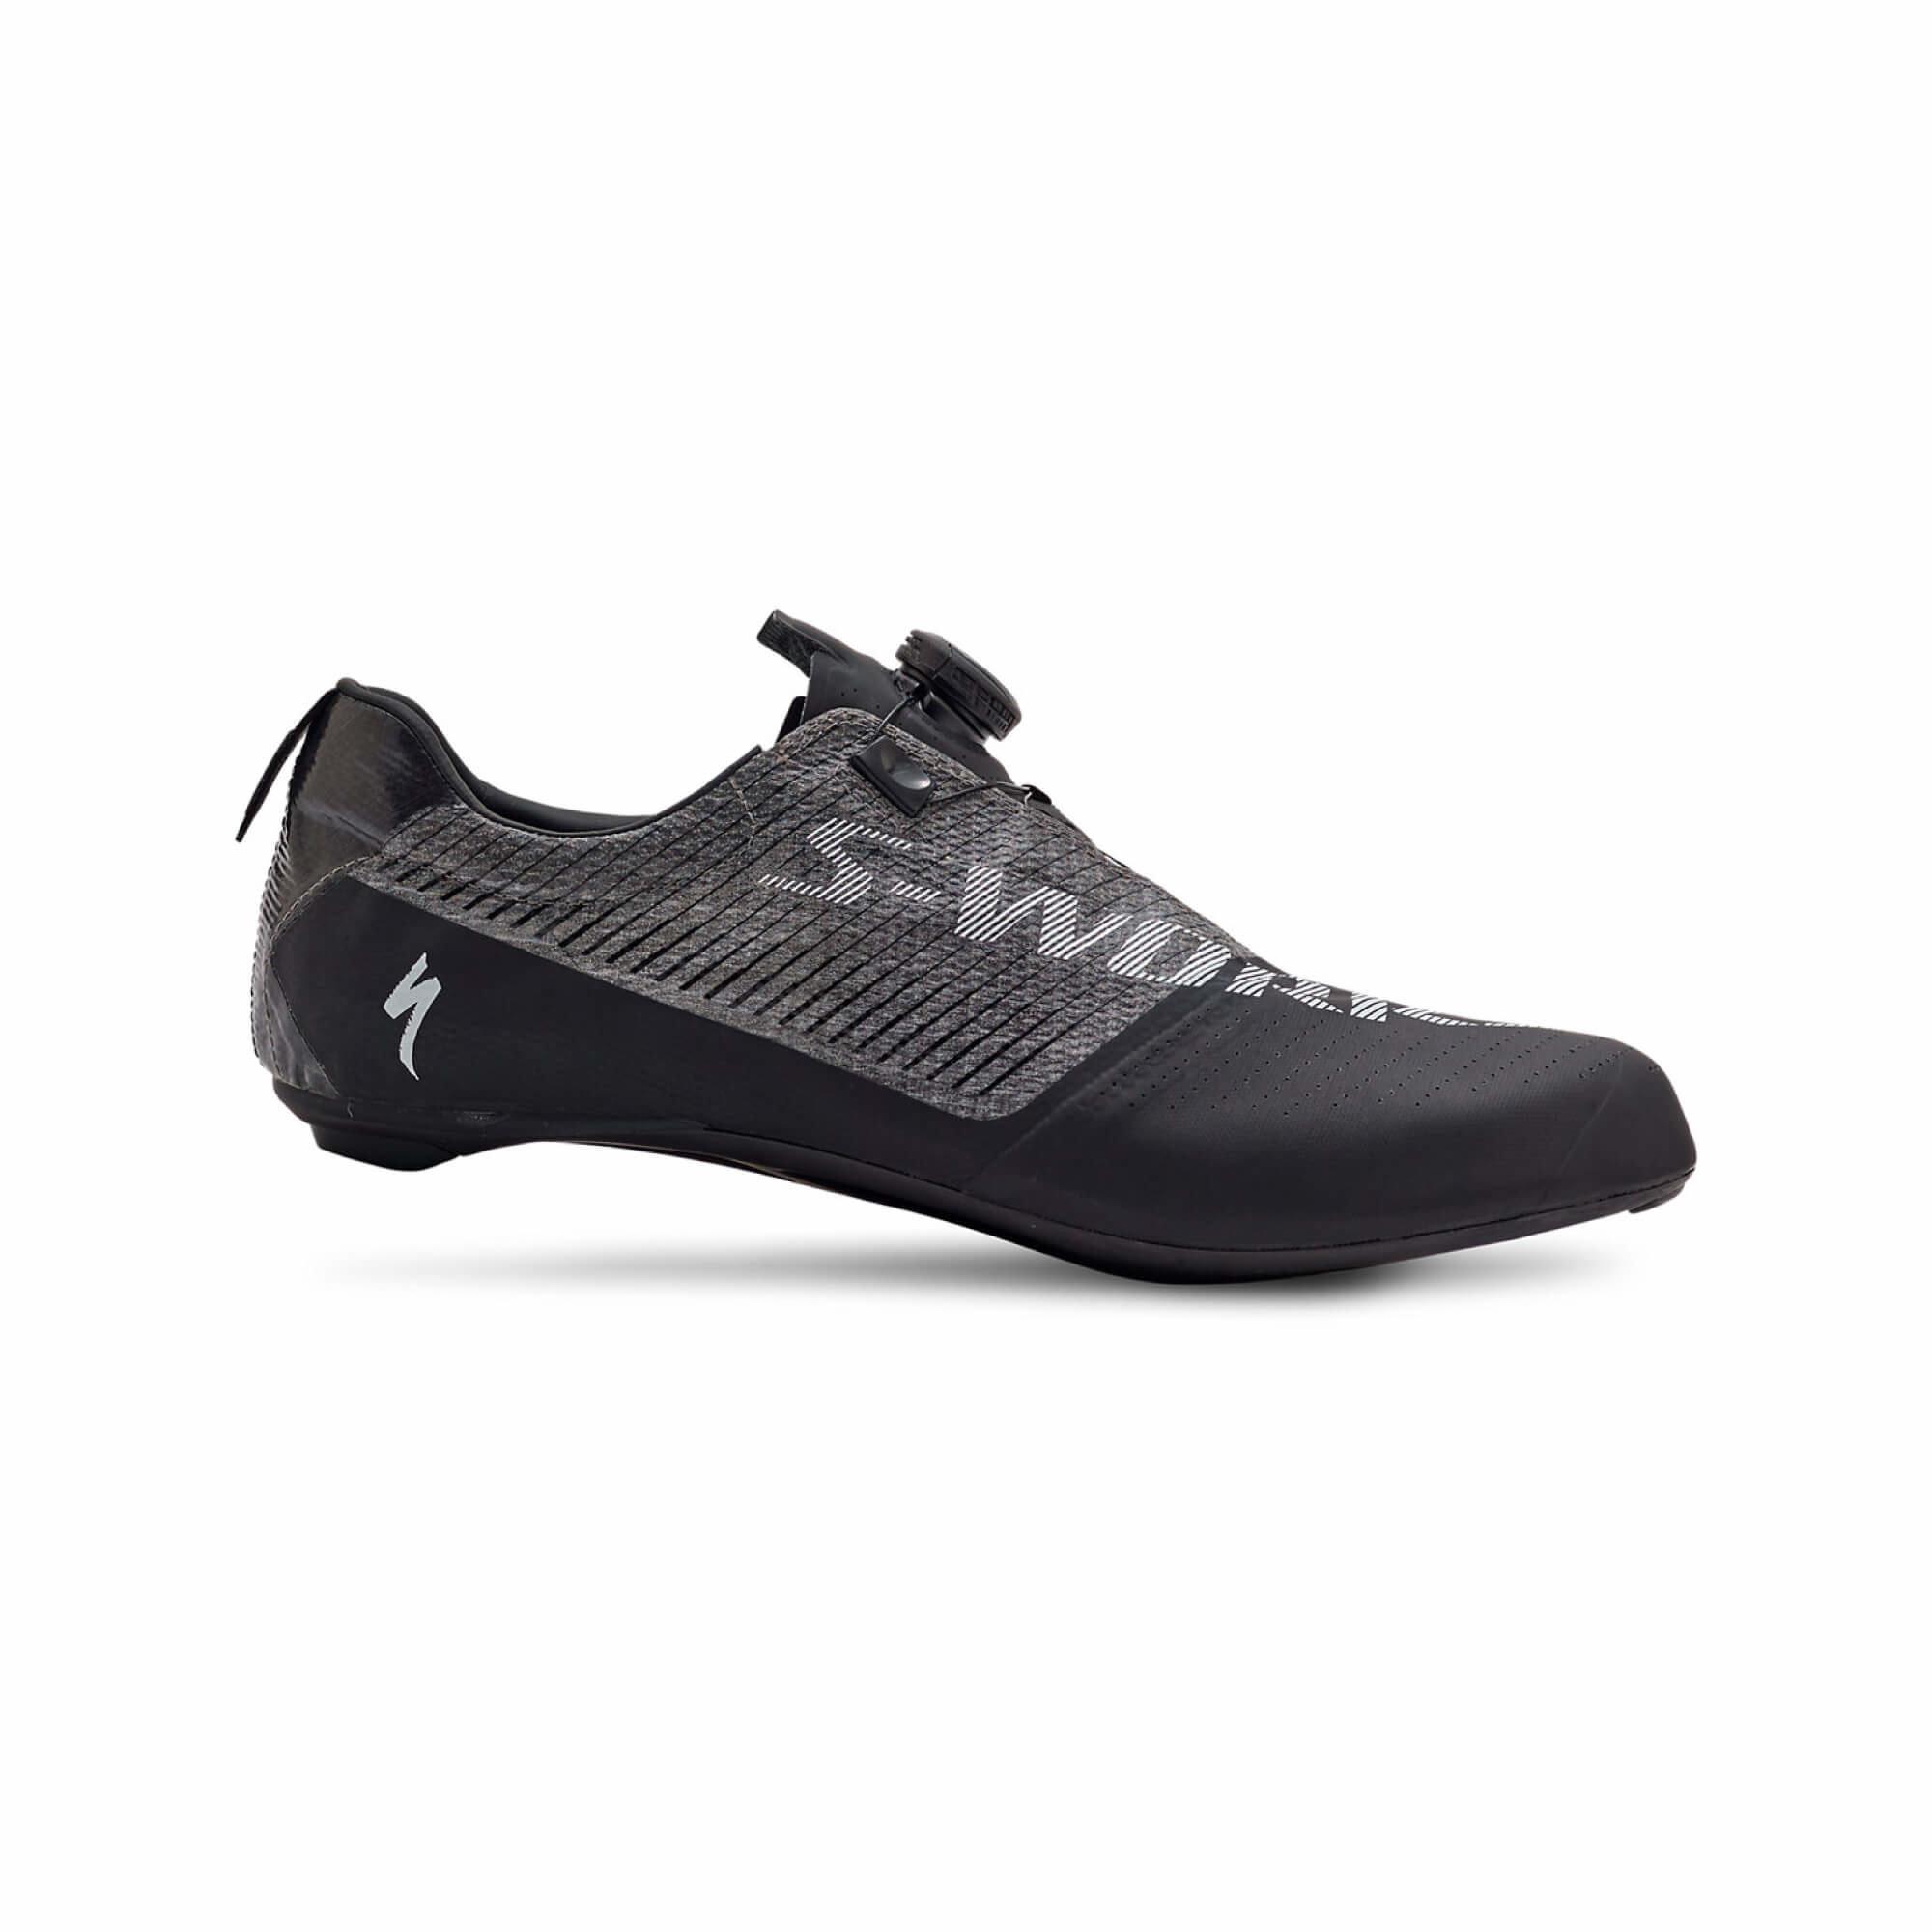 S-Works EXOS Road Shoe-10